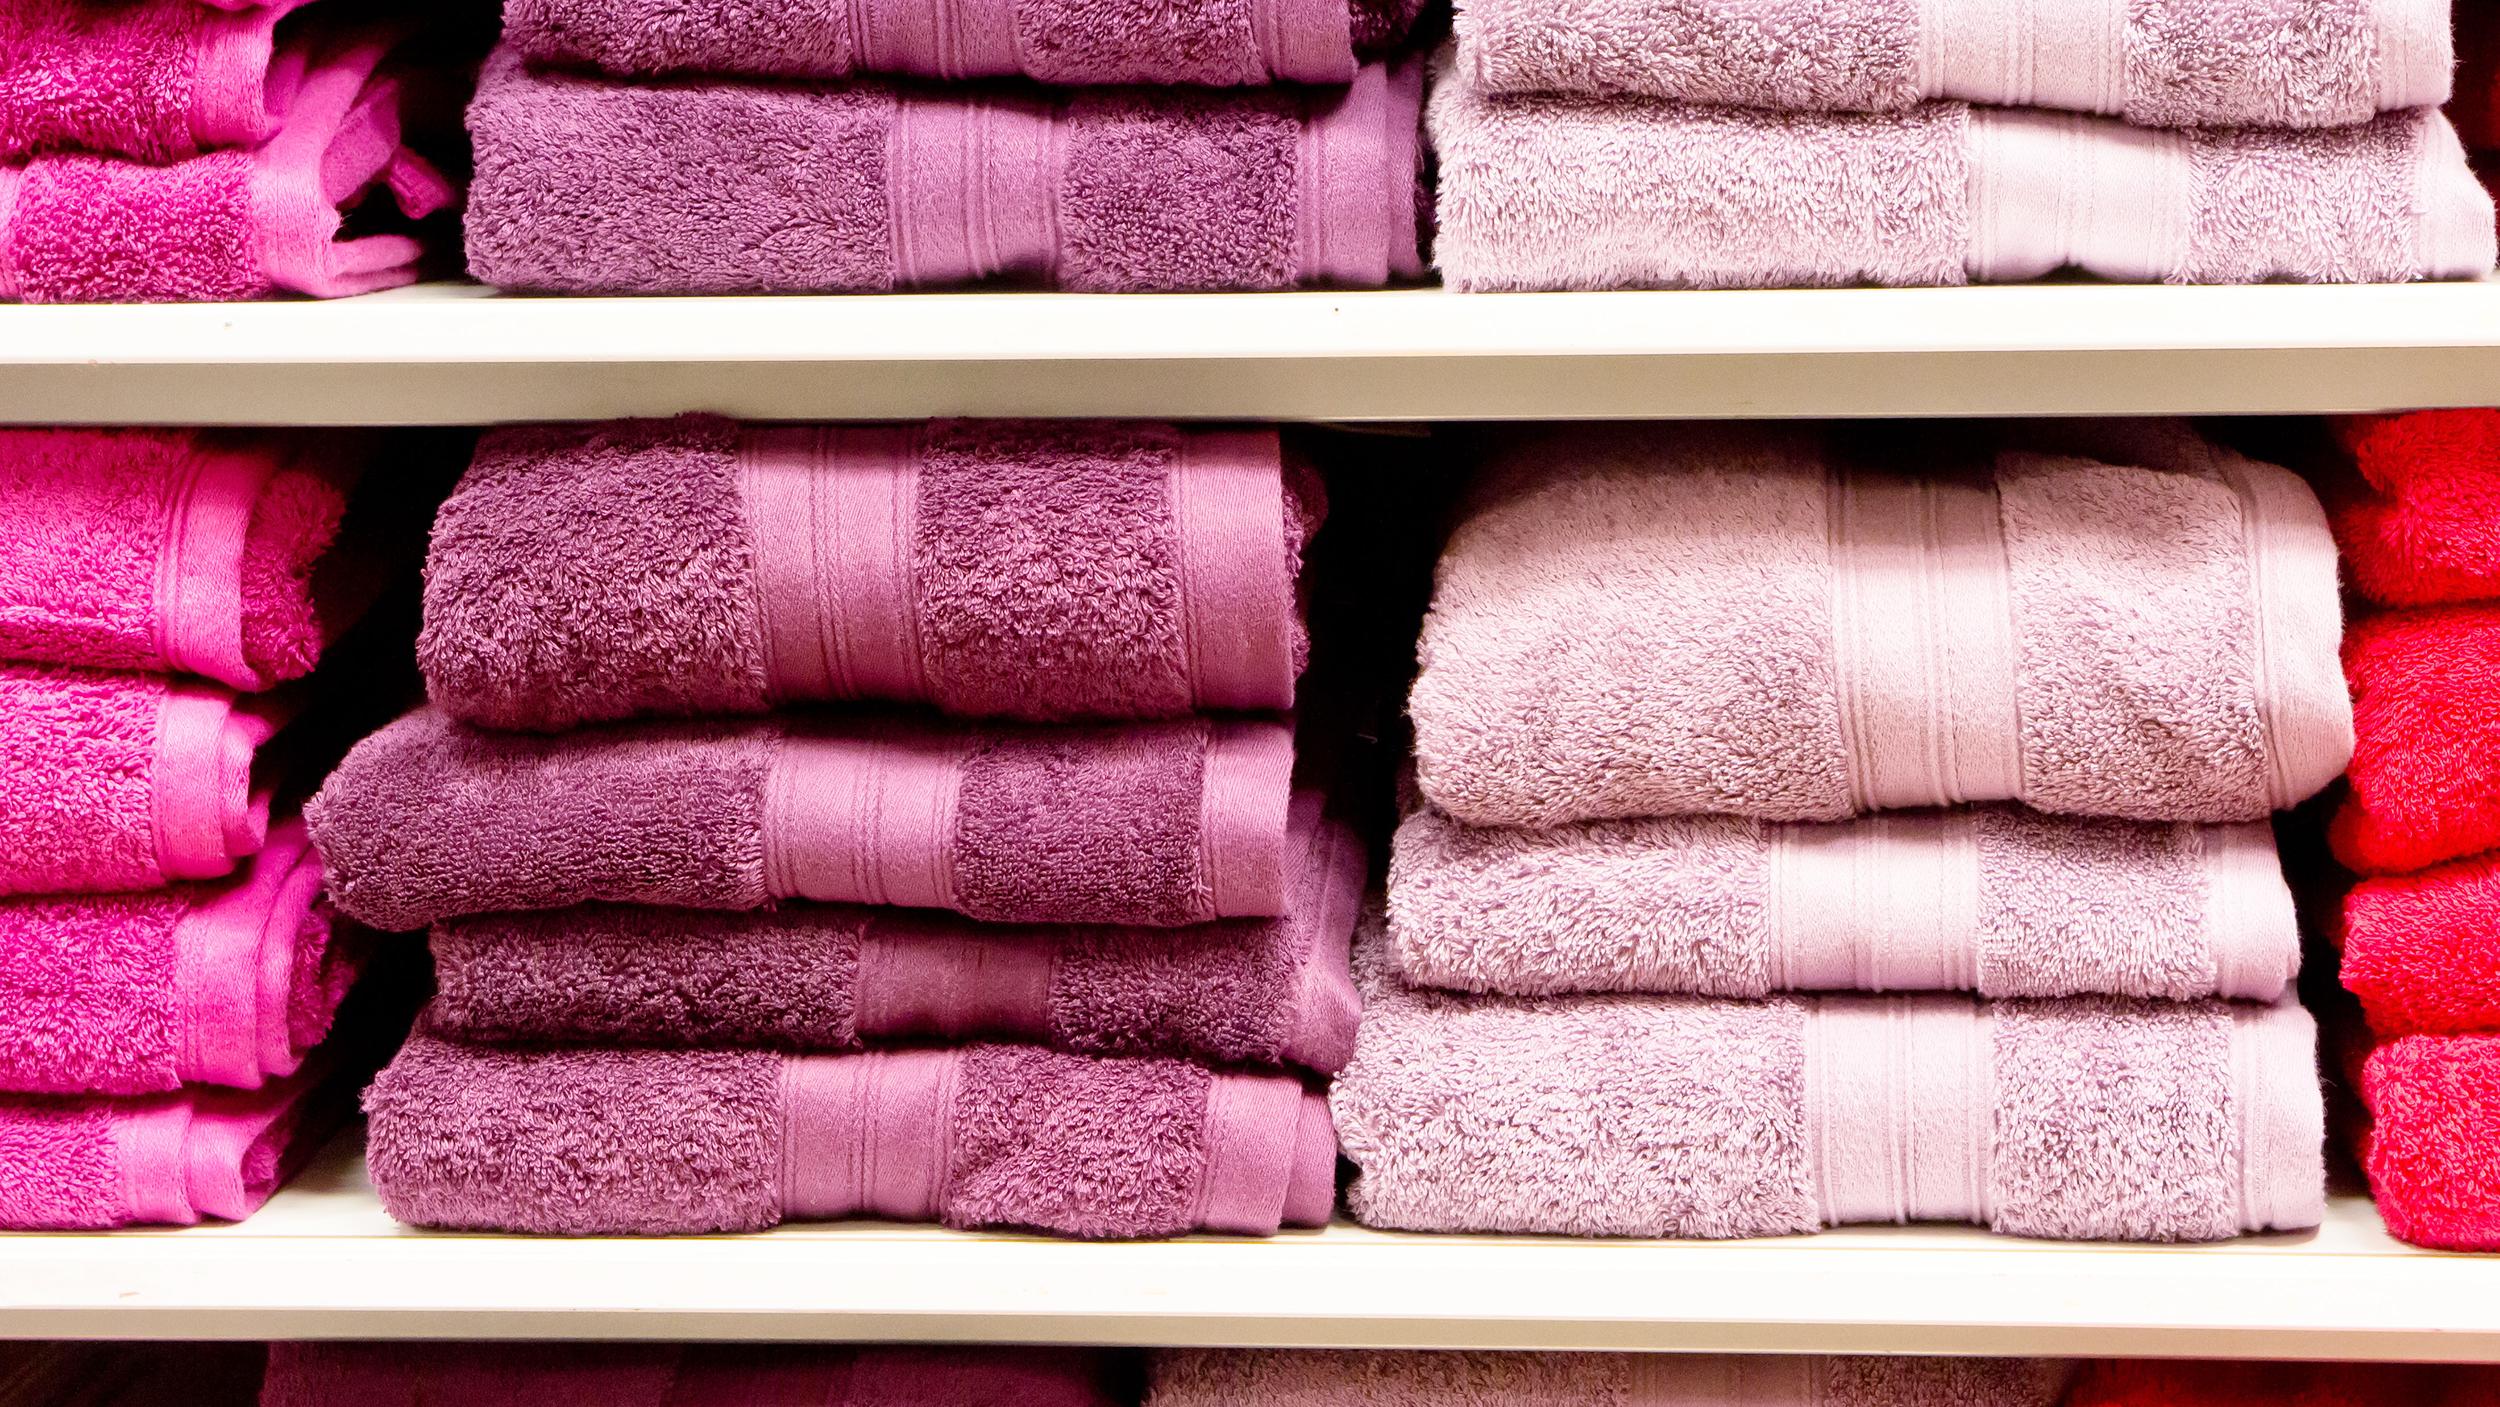 How often should you wash bath towels?